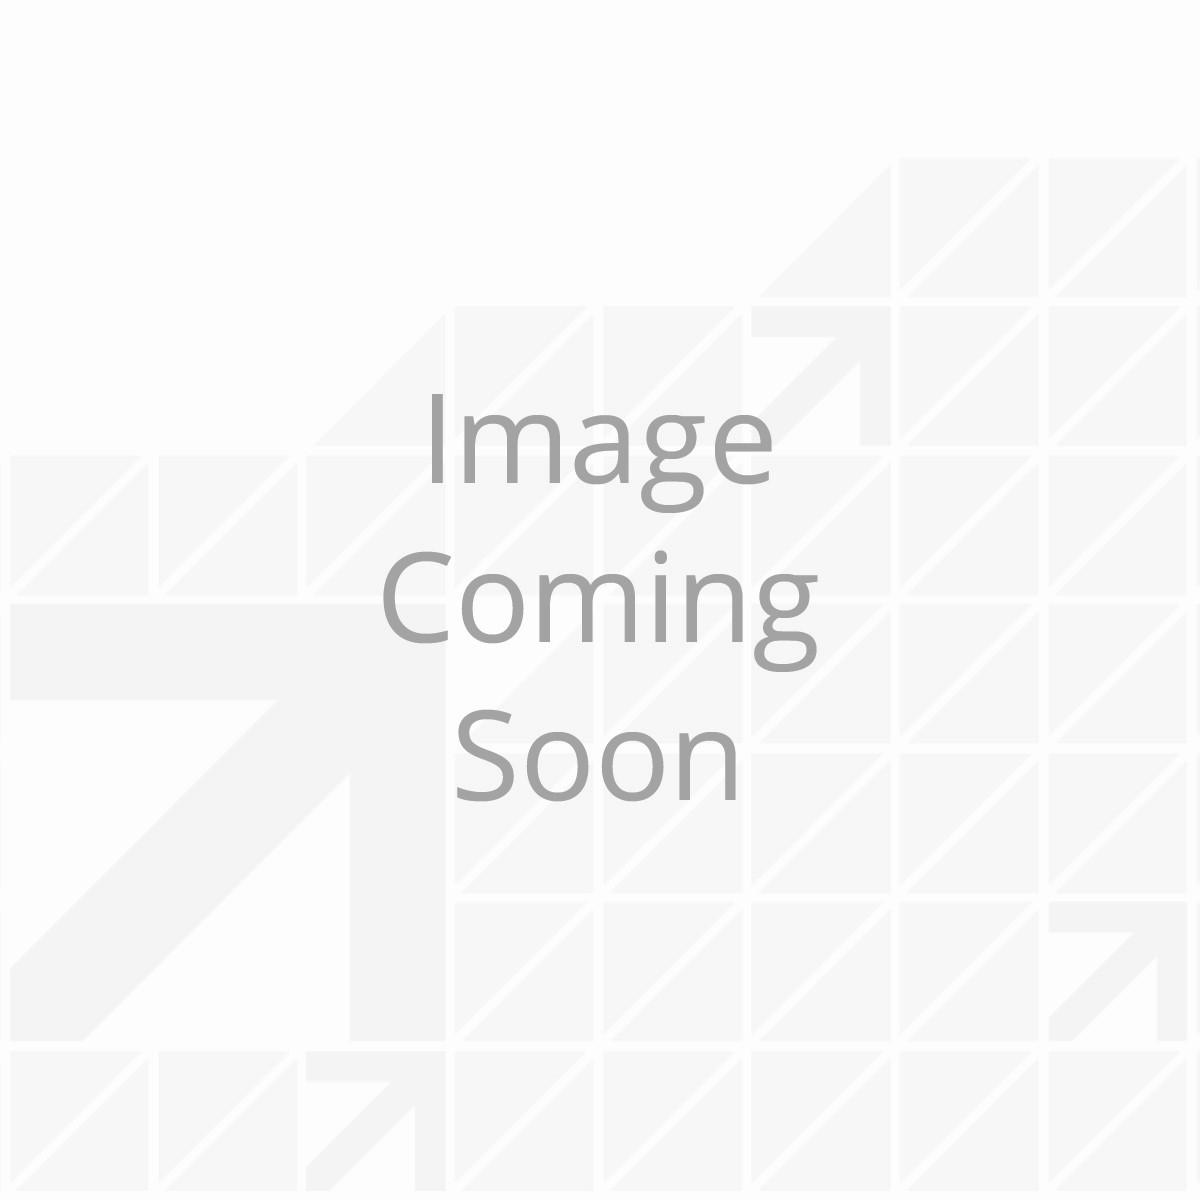 Discounted EGGCRATE MATTRESS 4IN PREMIUM (EA)